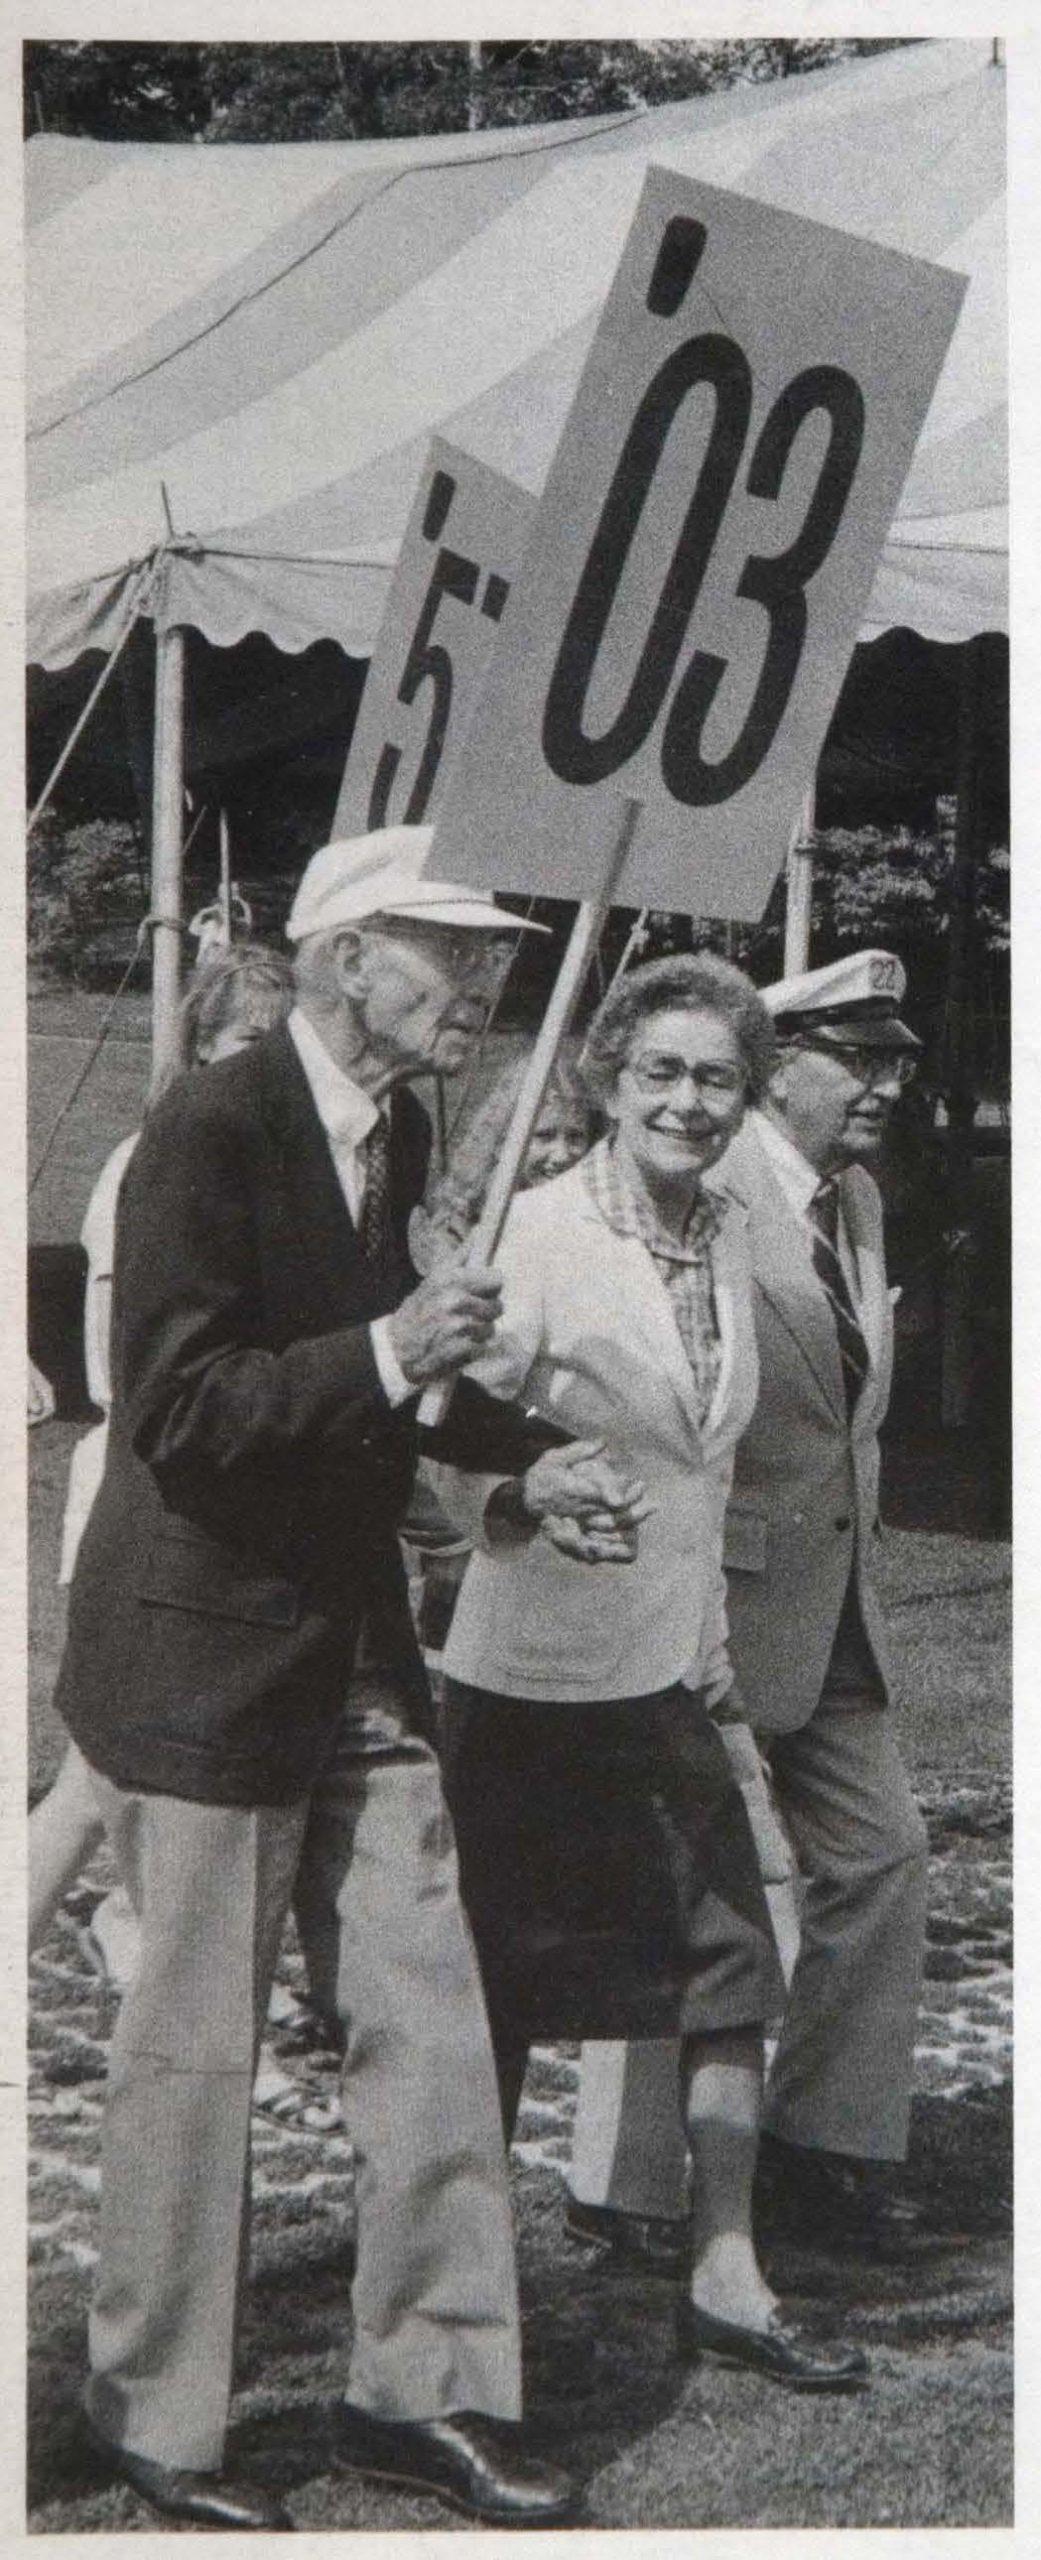 William M. Cooper, Class of 1903, celebrating his 79th reunion in 1982 (Summer 1982 Alumni Review)